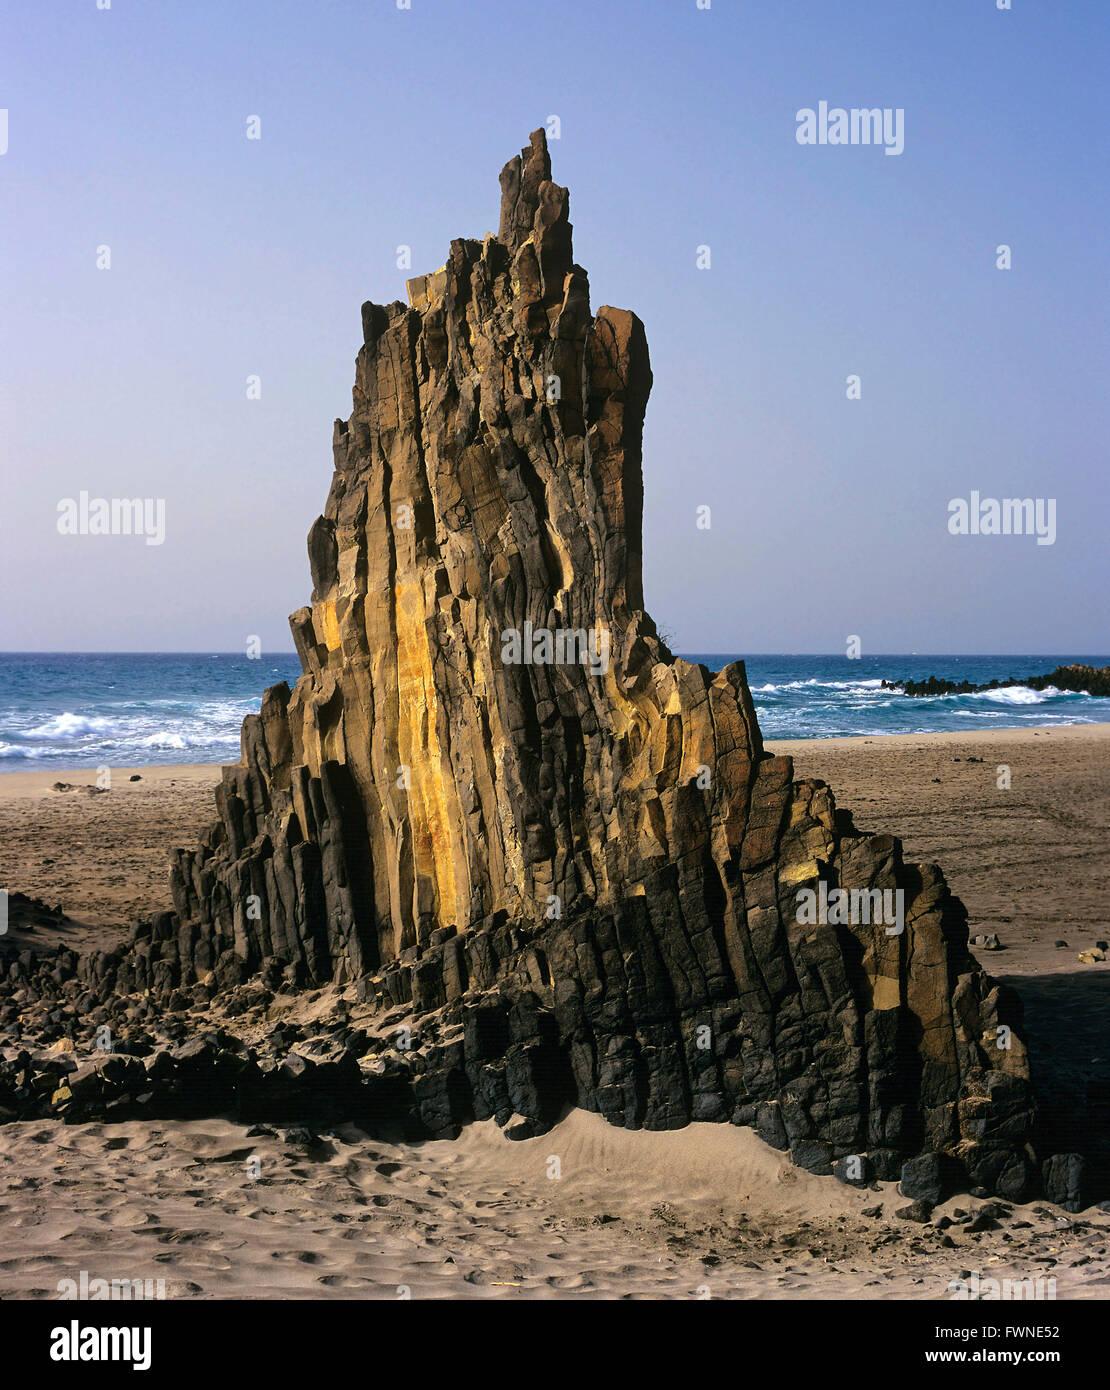 Basalts creek, Natural Park of Cabo de Gata Nijar, Almeria province, Region of Andalusia, Spain, Europe Stock Photo